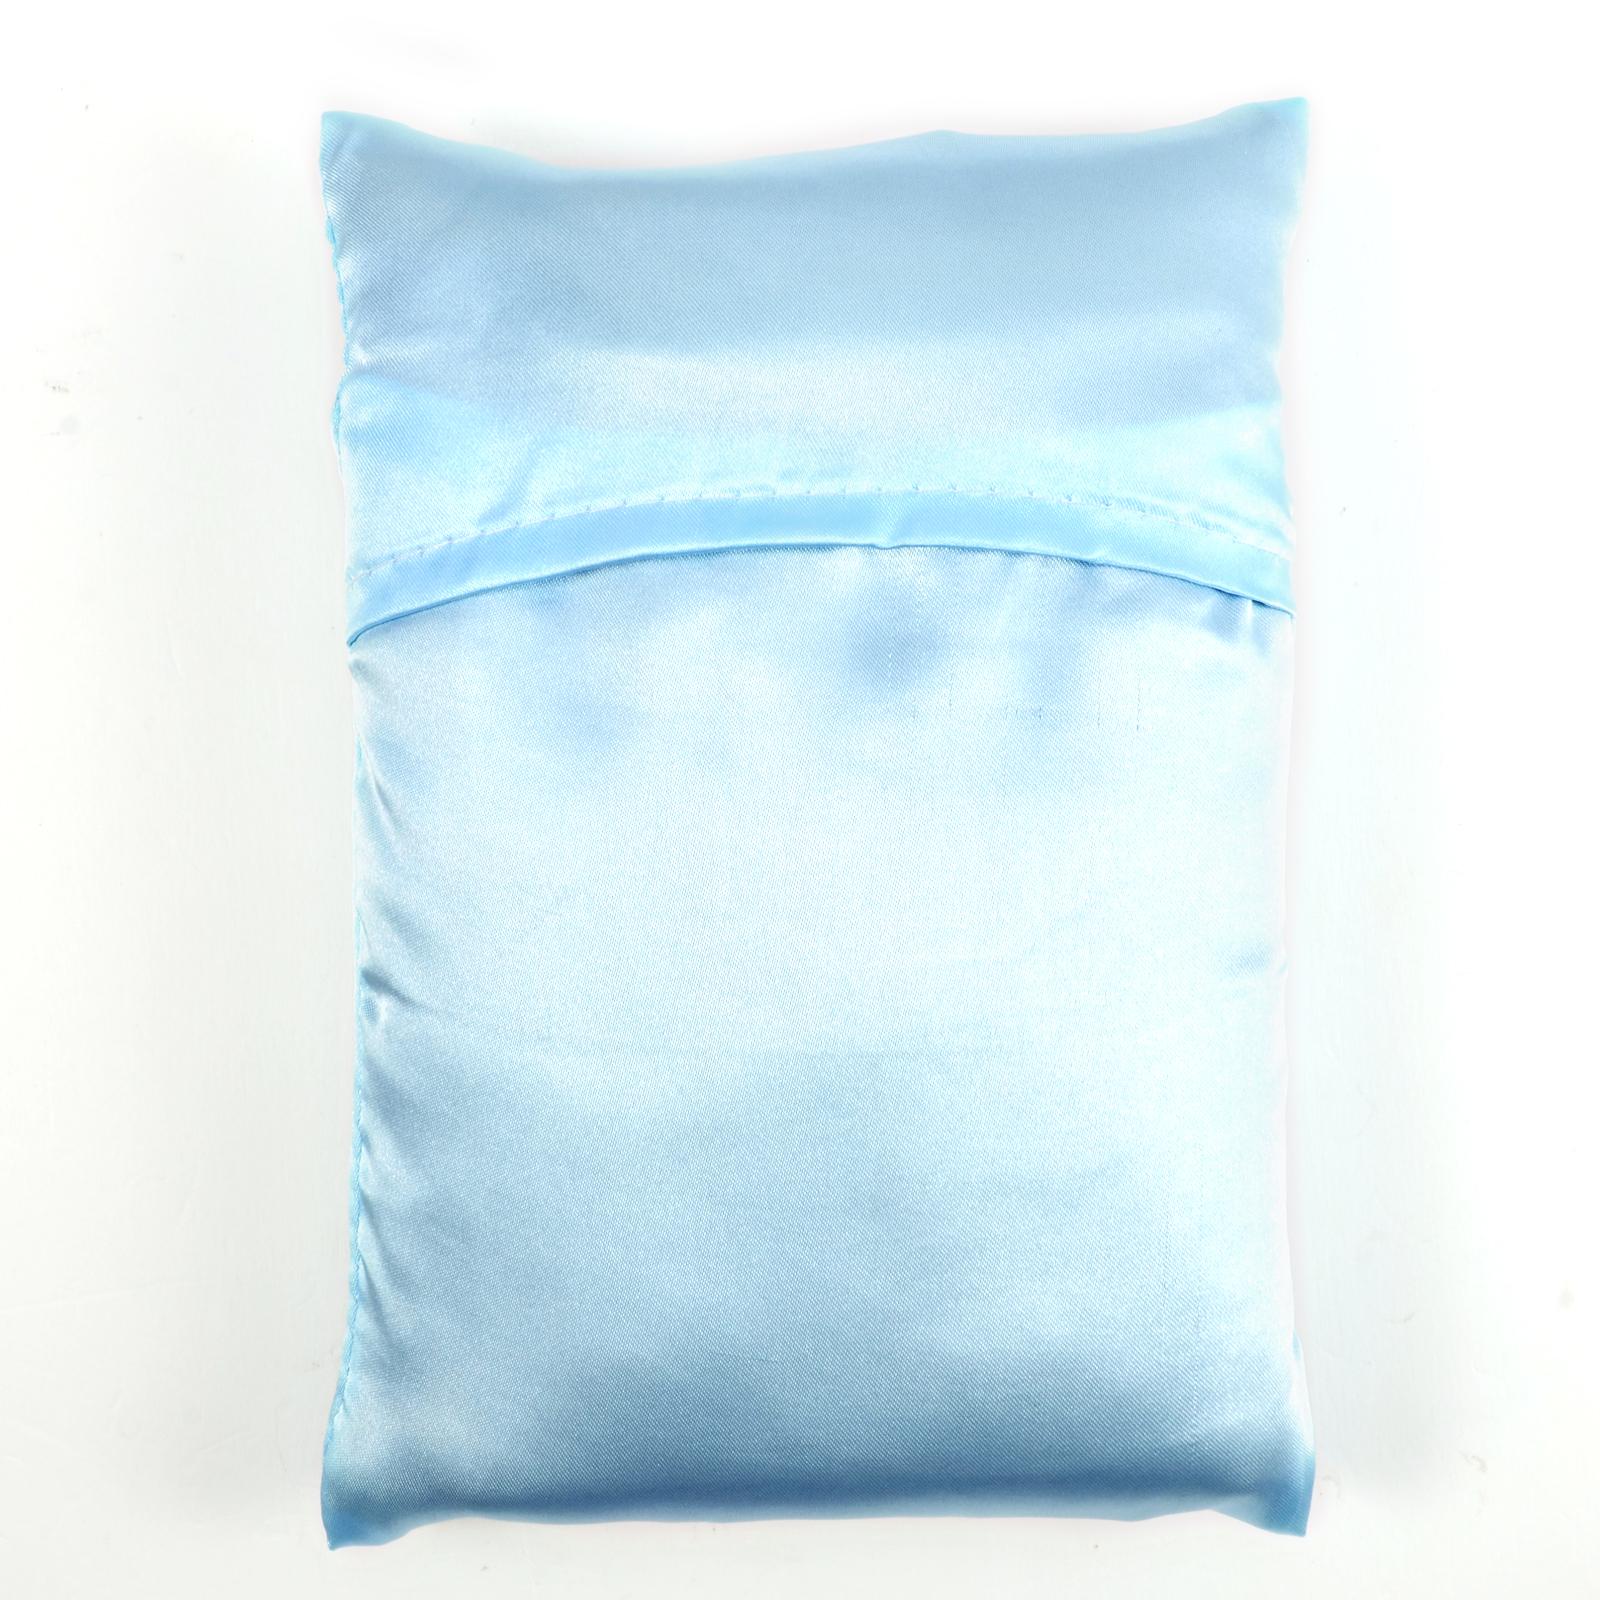 sac drap de couchage 1 personne soie non naturelle outdoor sport camping voyage ebay. Black Bedroom Furniture Sets. Home Design Ideas